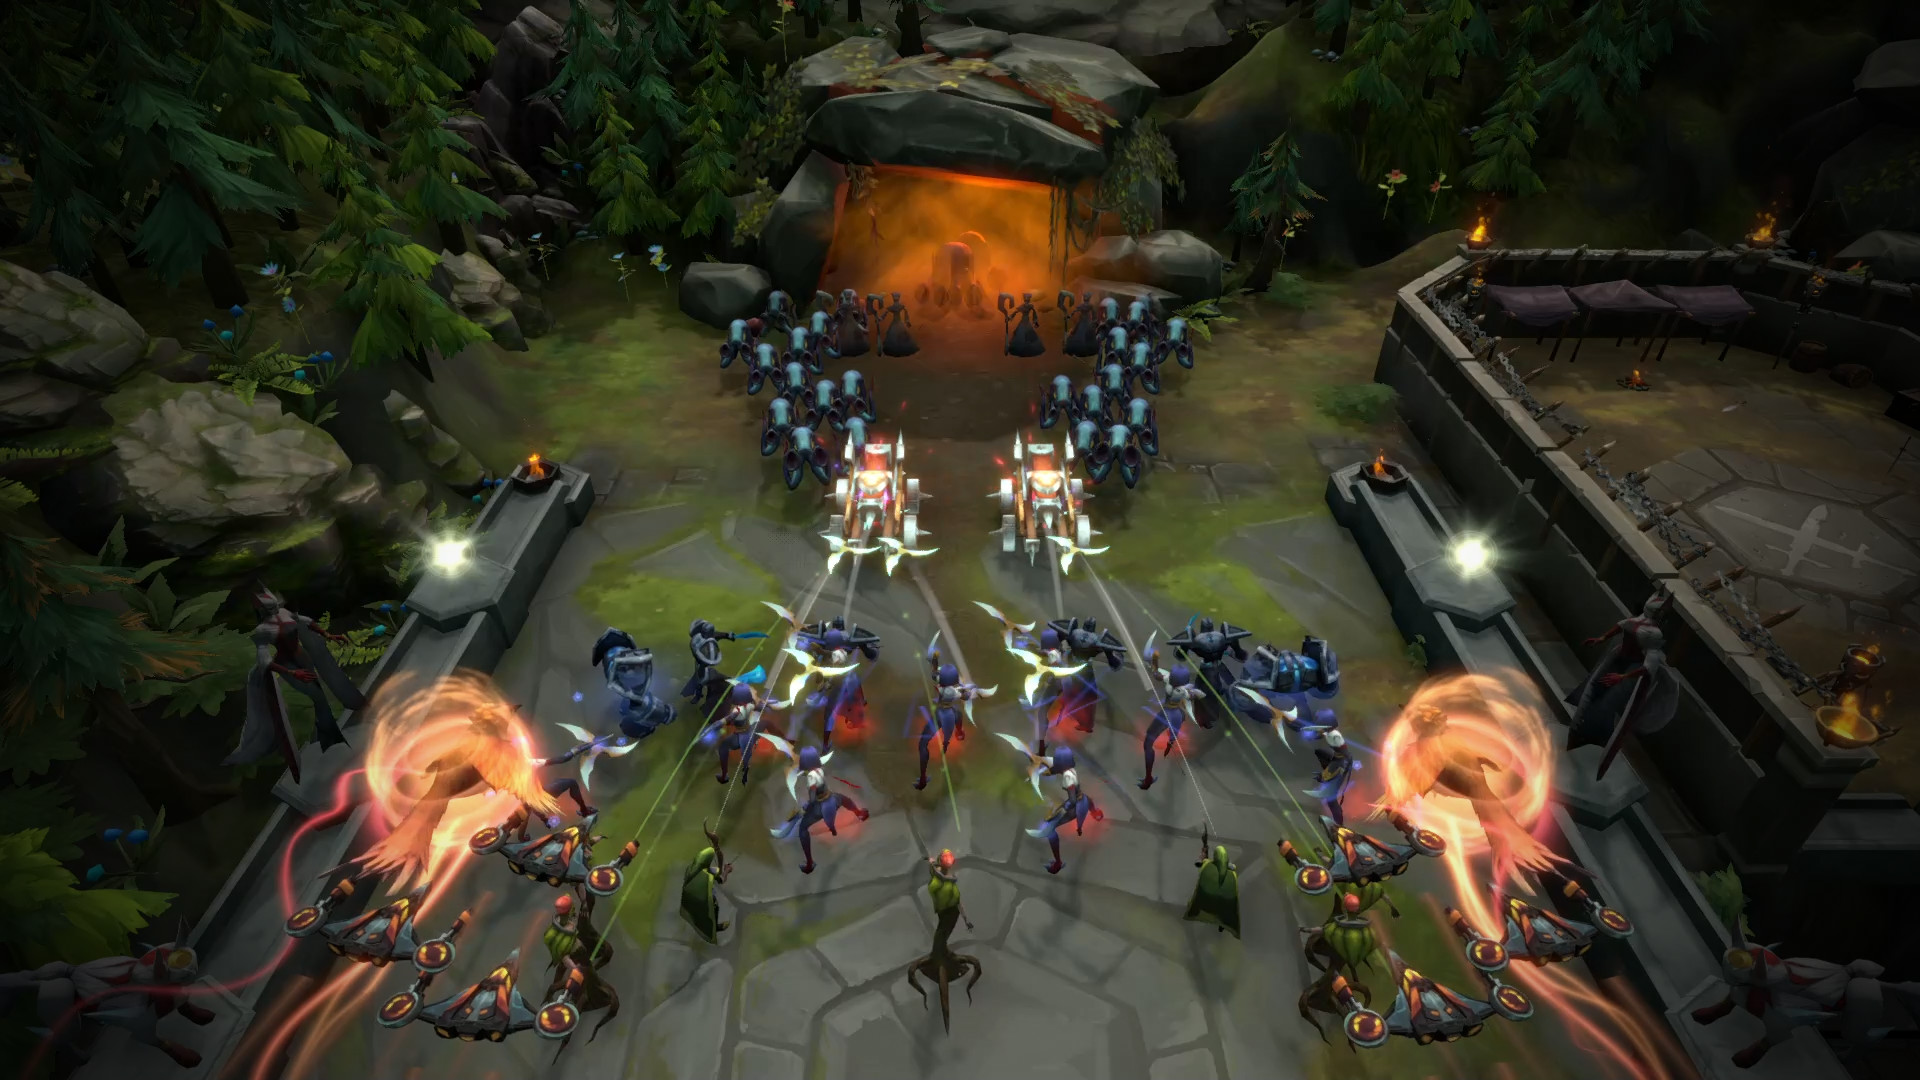 Legion TD 2 - Multiplayer Tower Defense Free Download